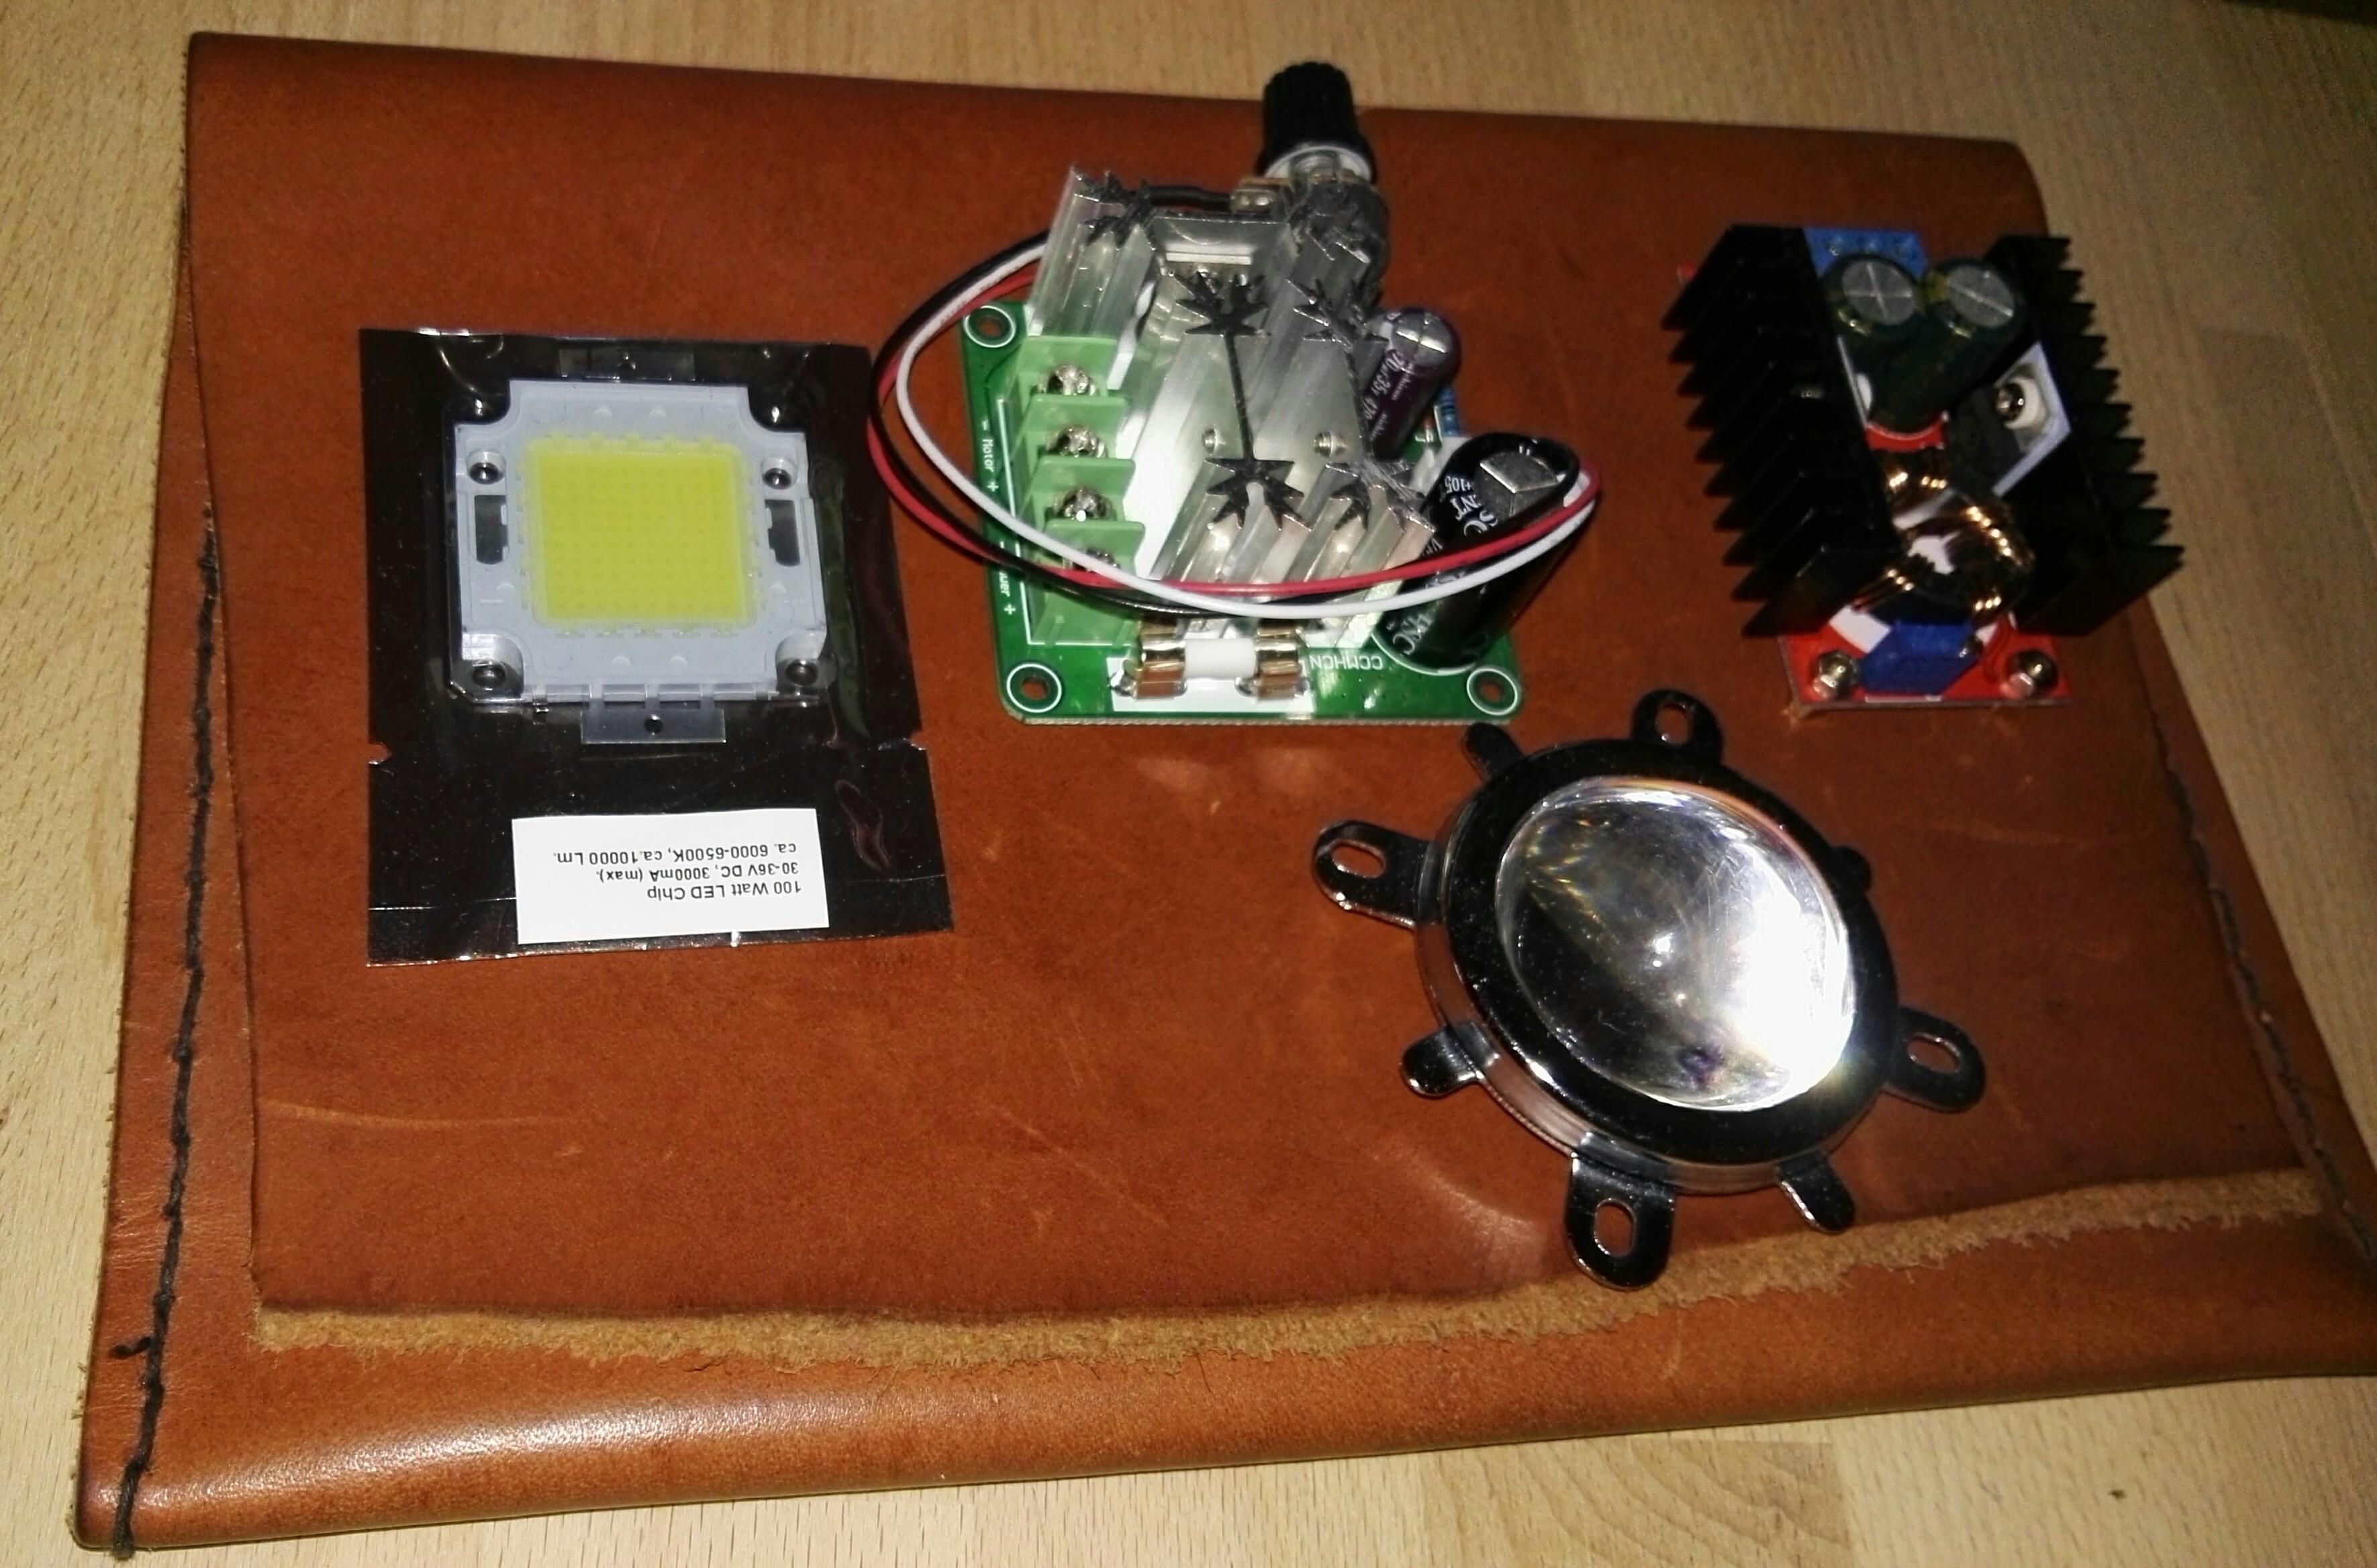 img_20160105_20125401.jpg Wunderschöne Led Lampen 100 Watt Dekorationen